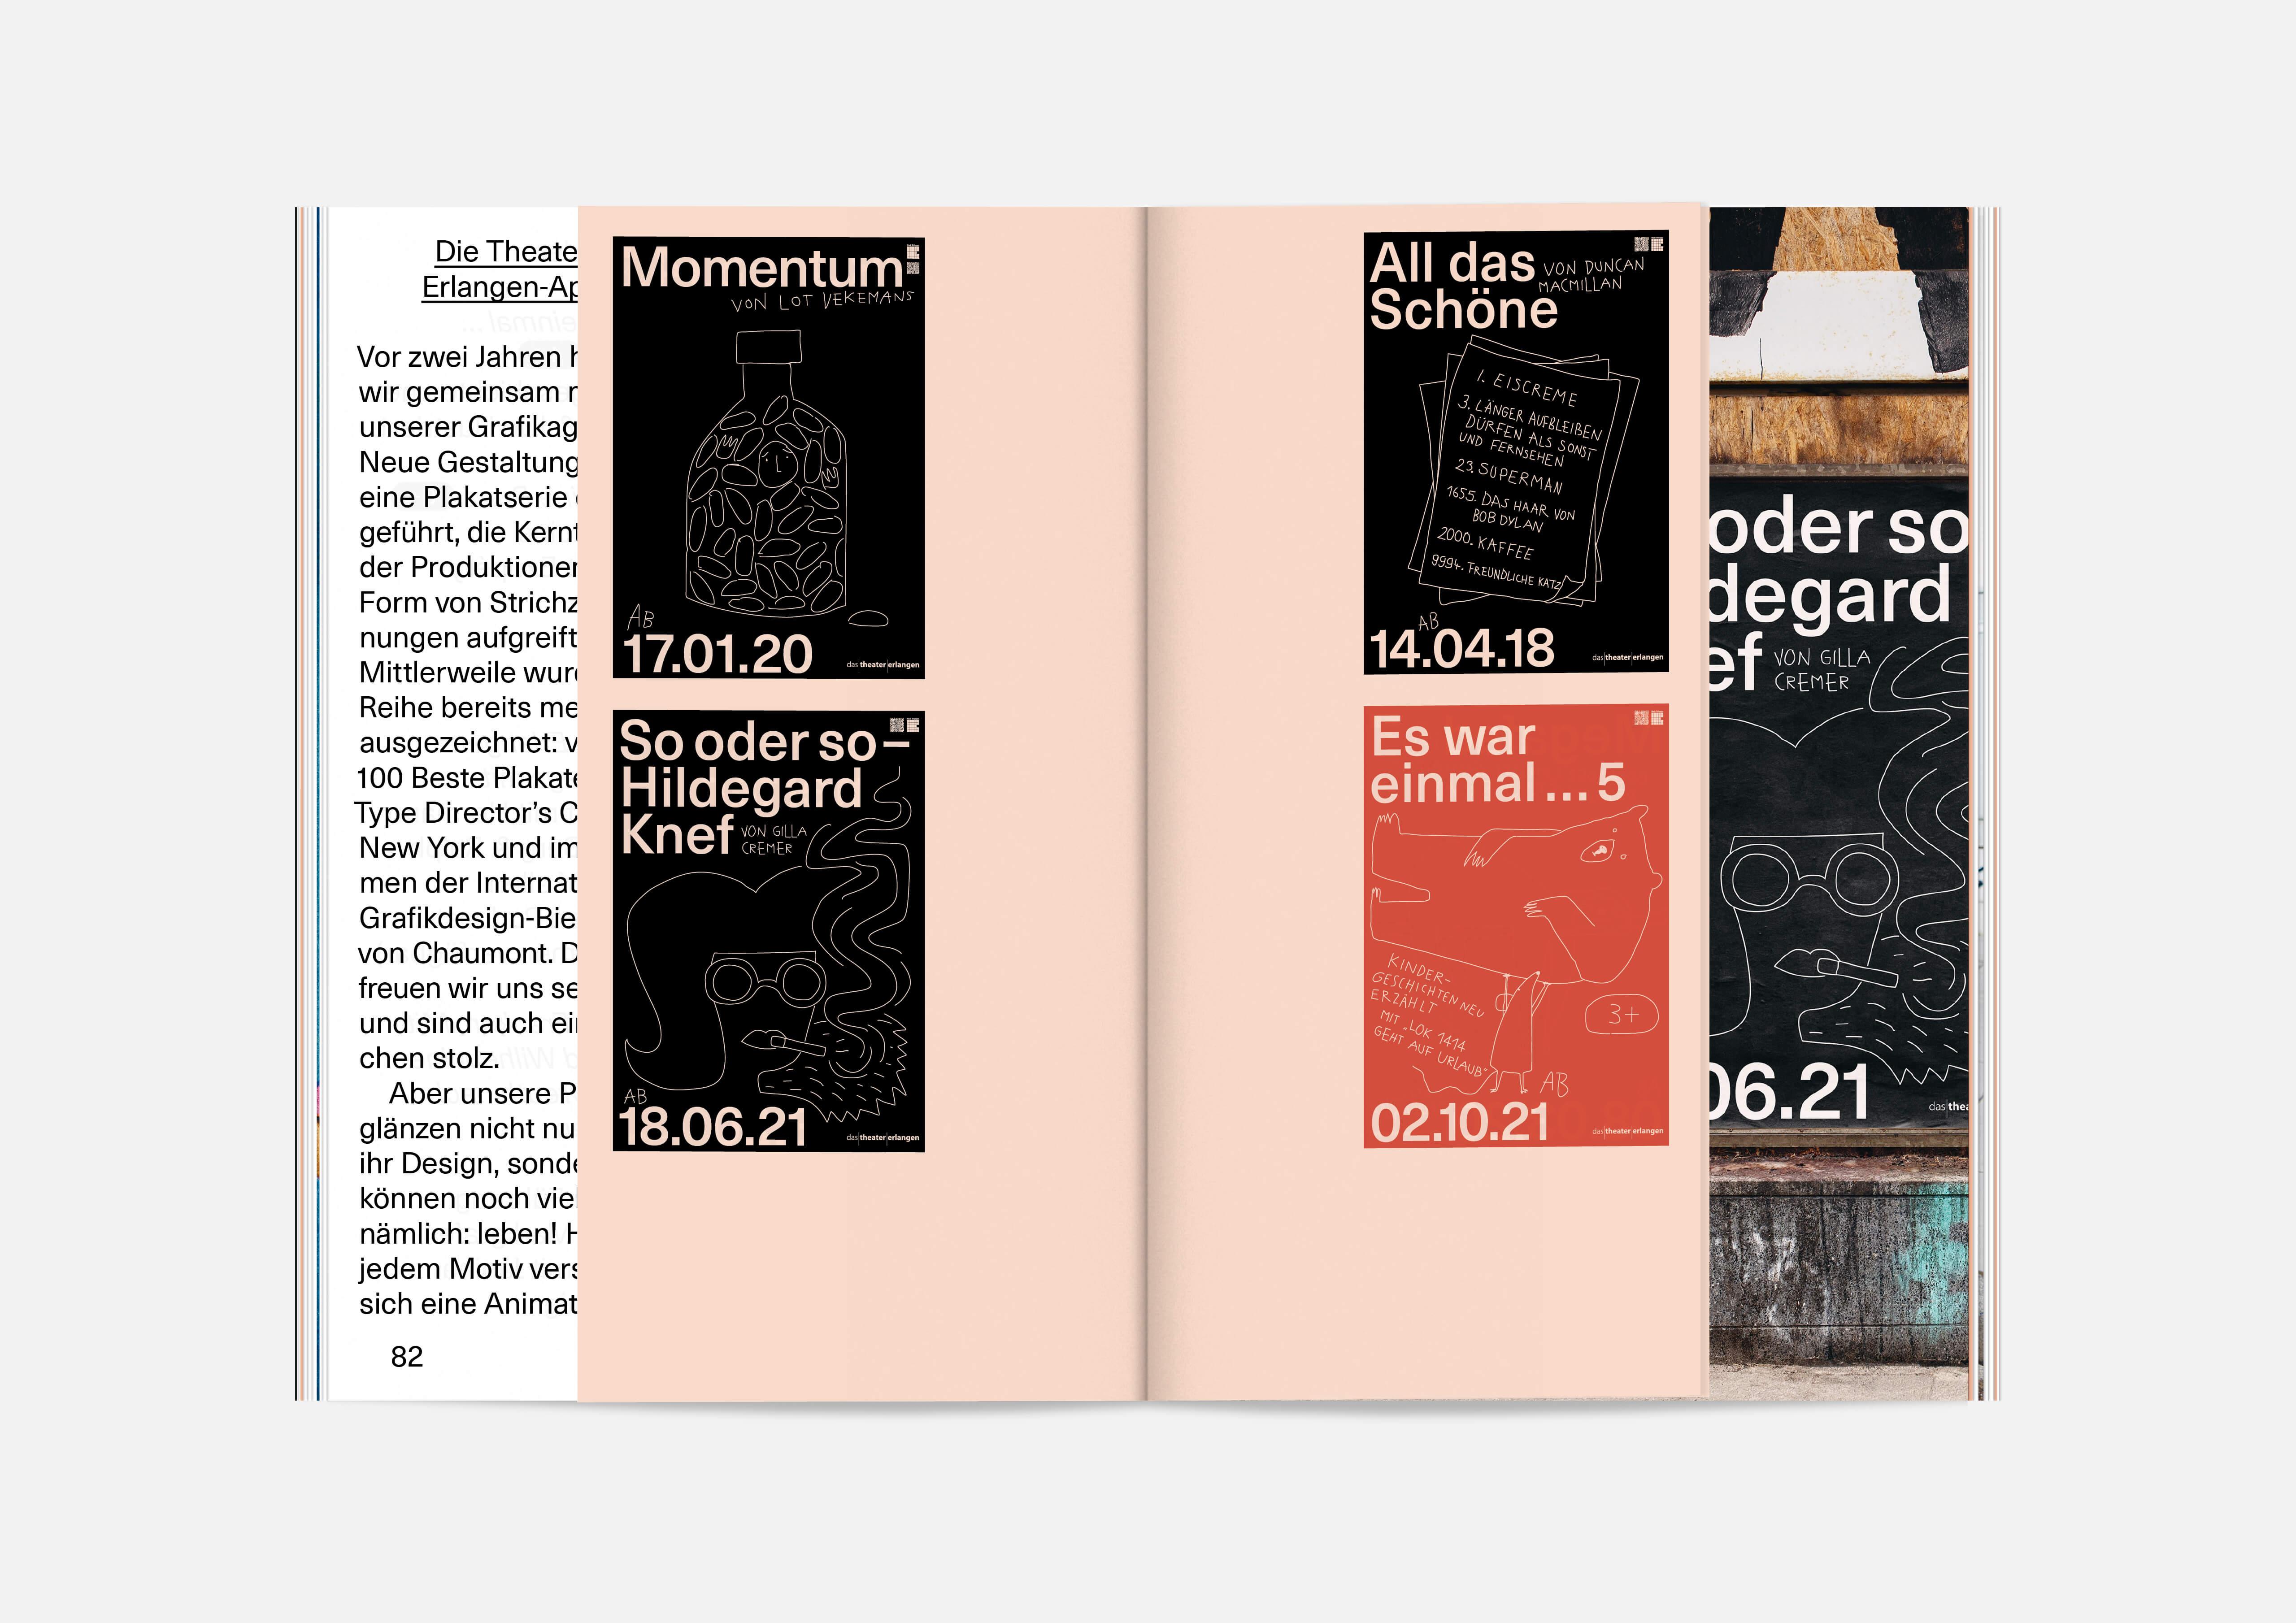 https://neuegestaltung.de/media/pages/clients/theater-erlangen-seasonal-program-2021-22/129949c214-1630497301/te-szh-202122_21.jpg